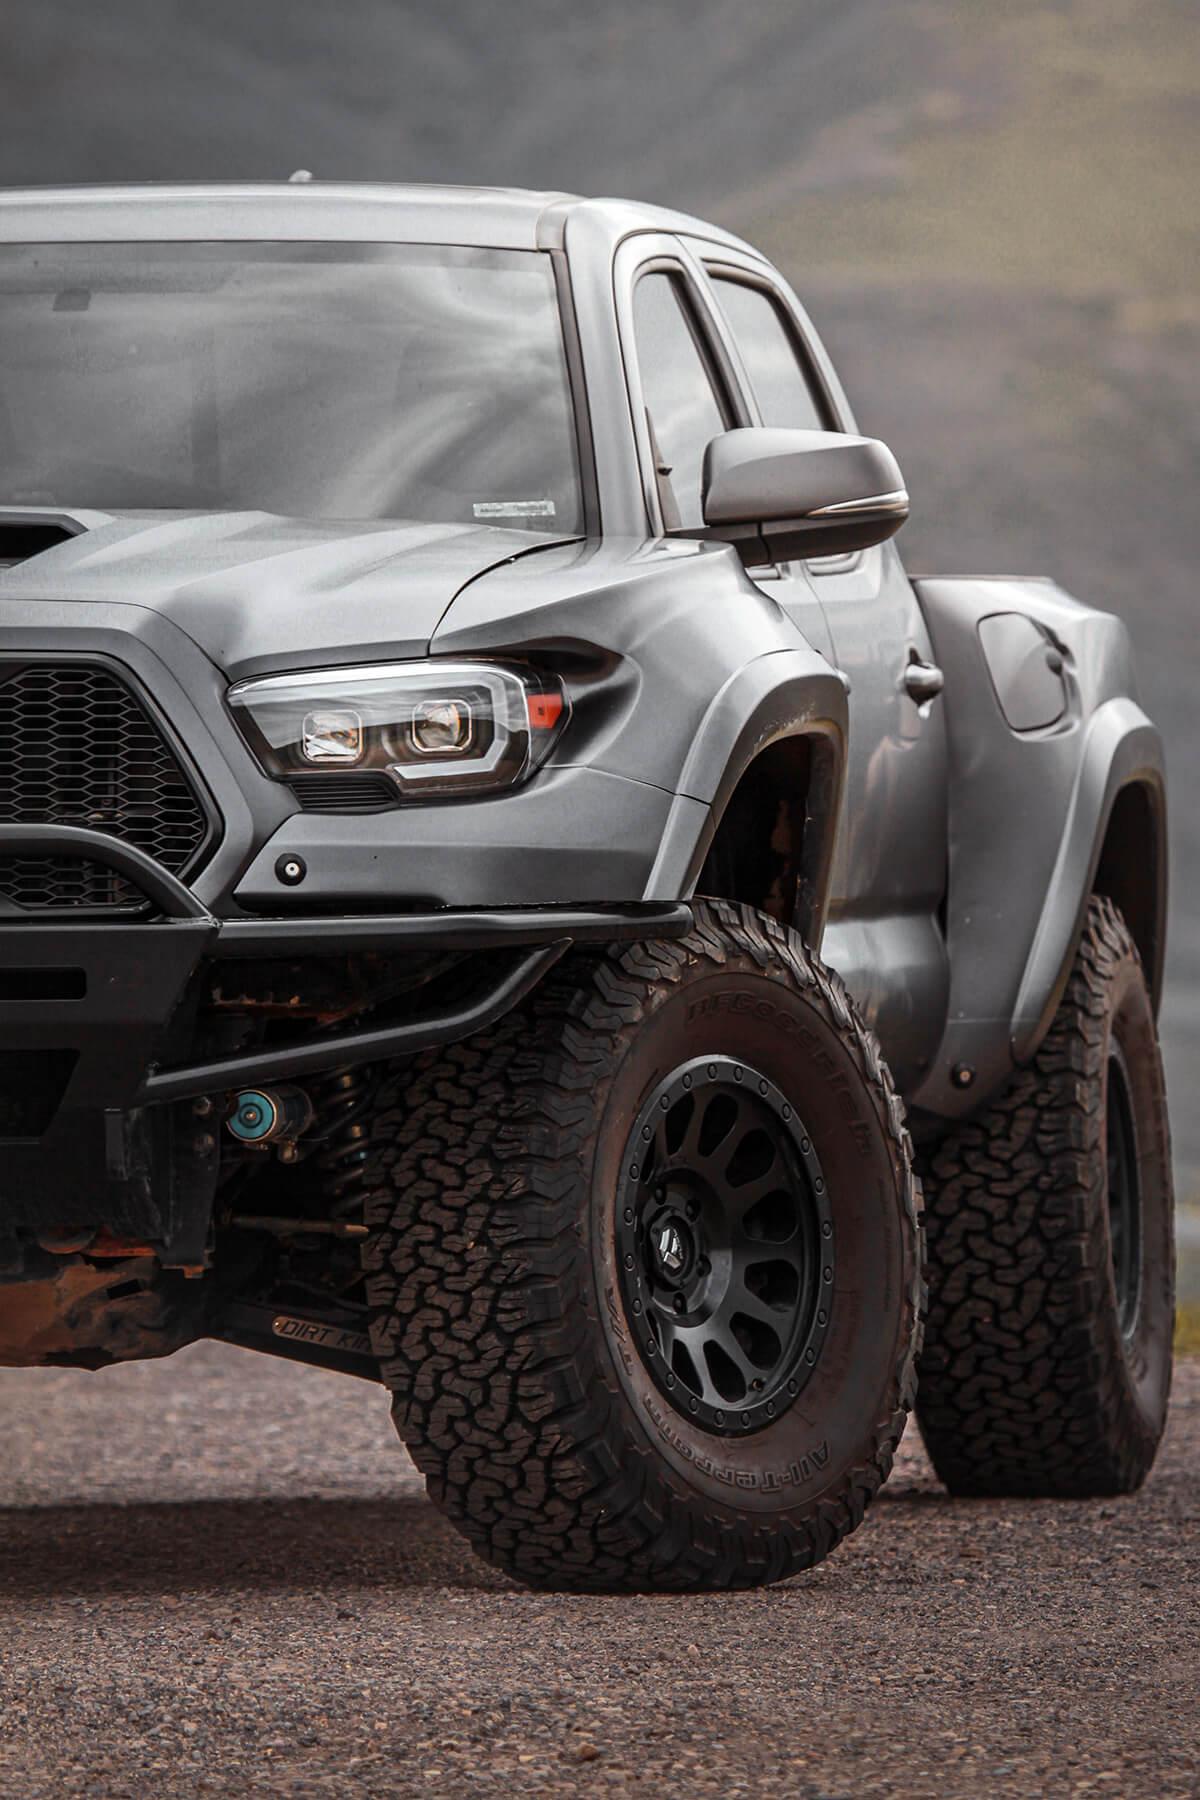 Long Travel Toyota Tacoma Prerunner DIY build